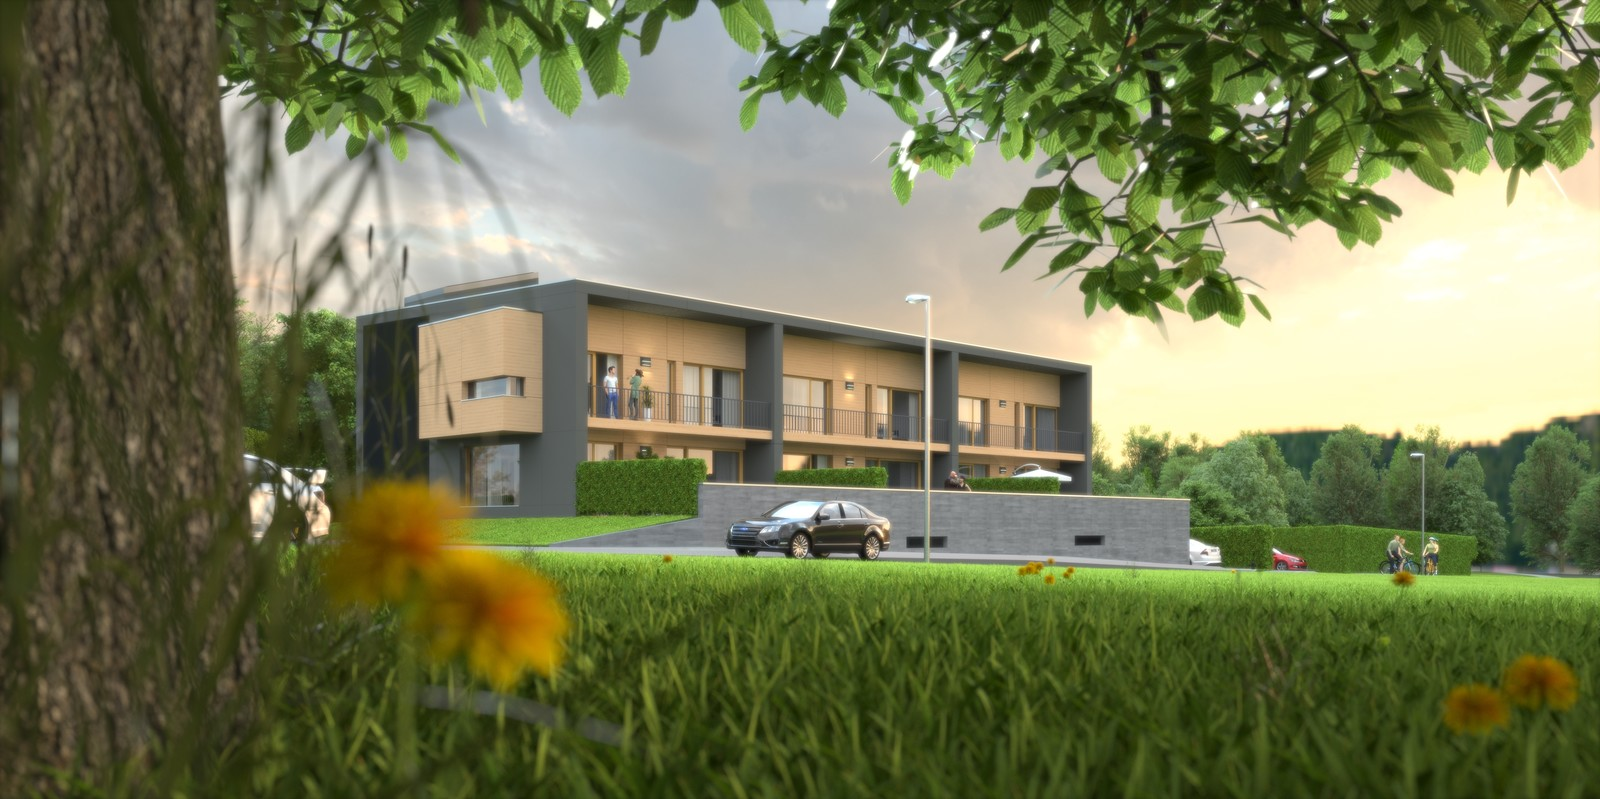 09 Exterior SW under tree 04 Final 02 BIG 02  KP webpage of project: http://www.kemppro.com/KP_3D_communication_3_Villas_Veyrier.html